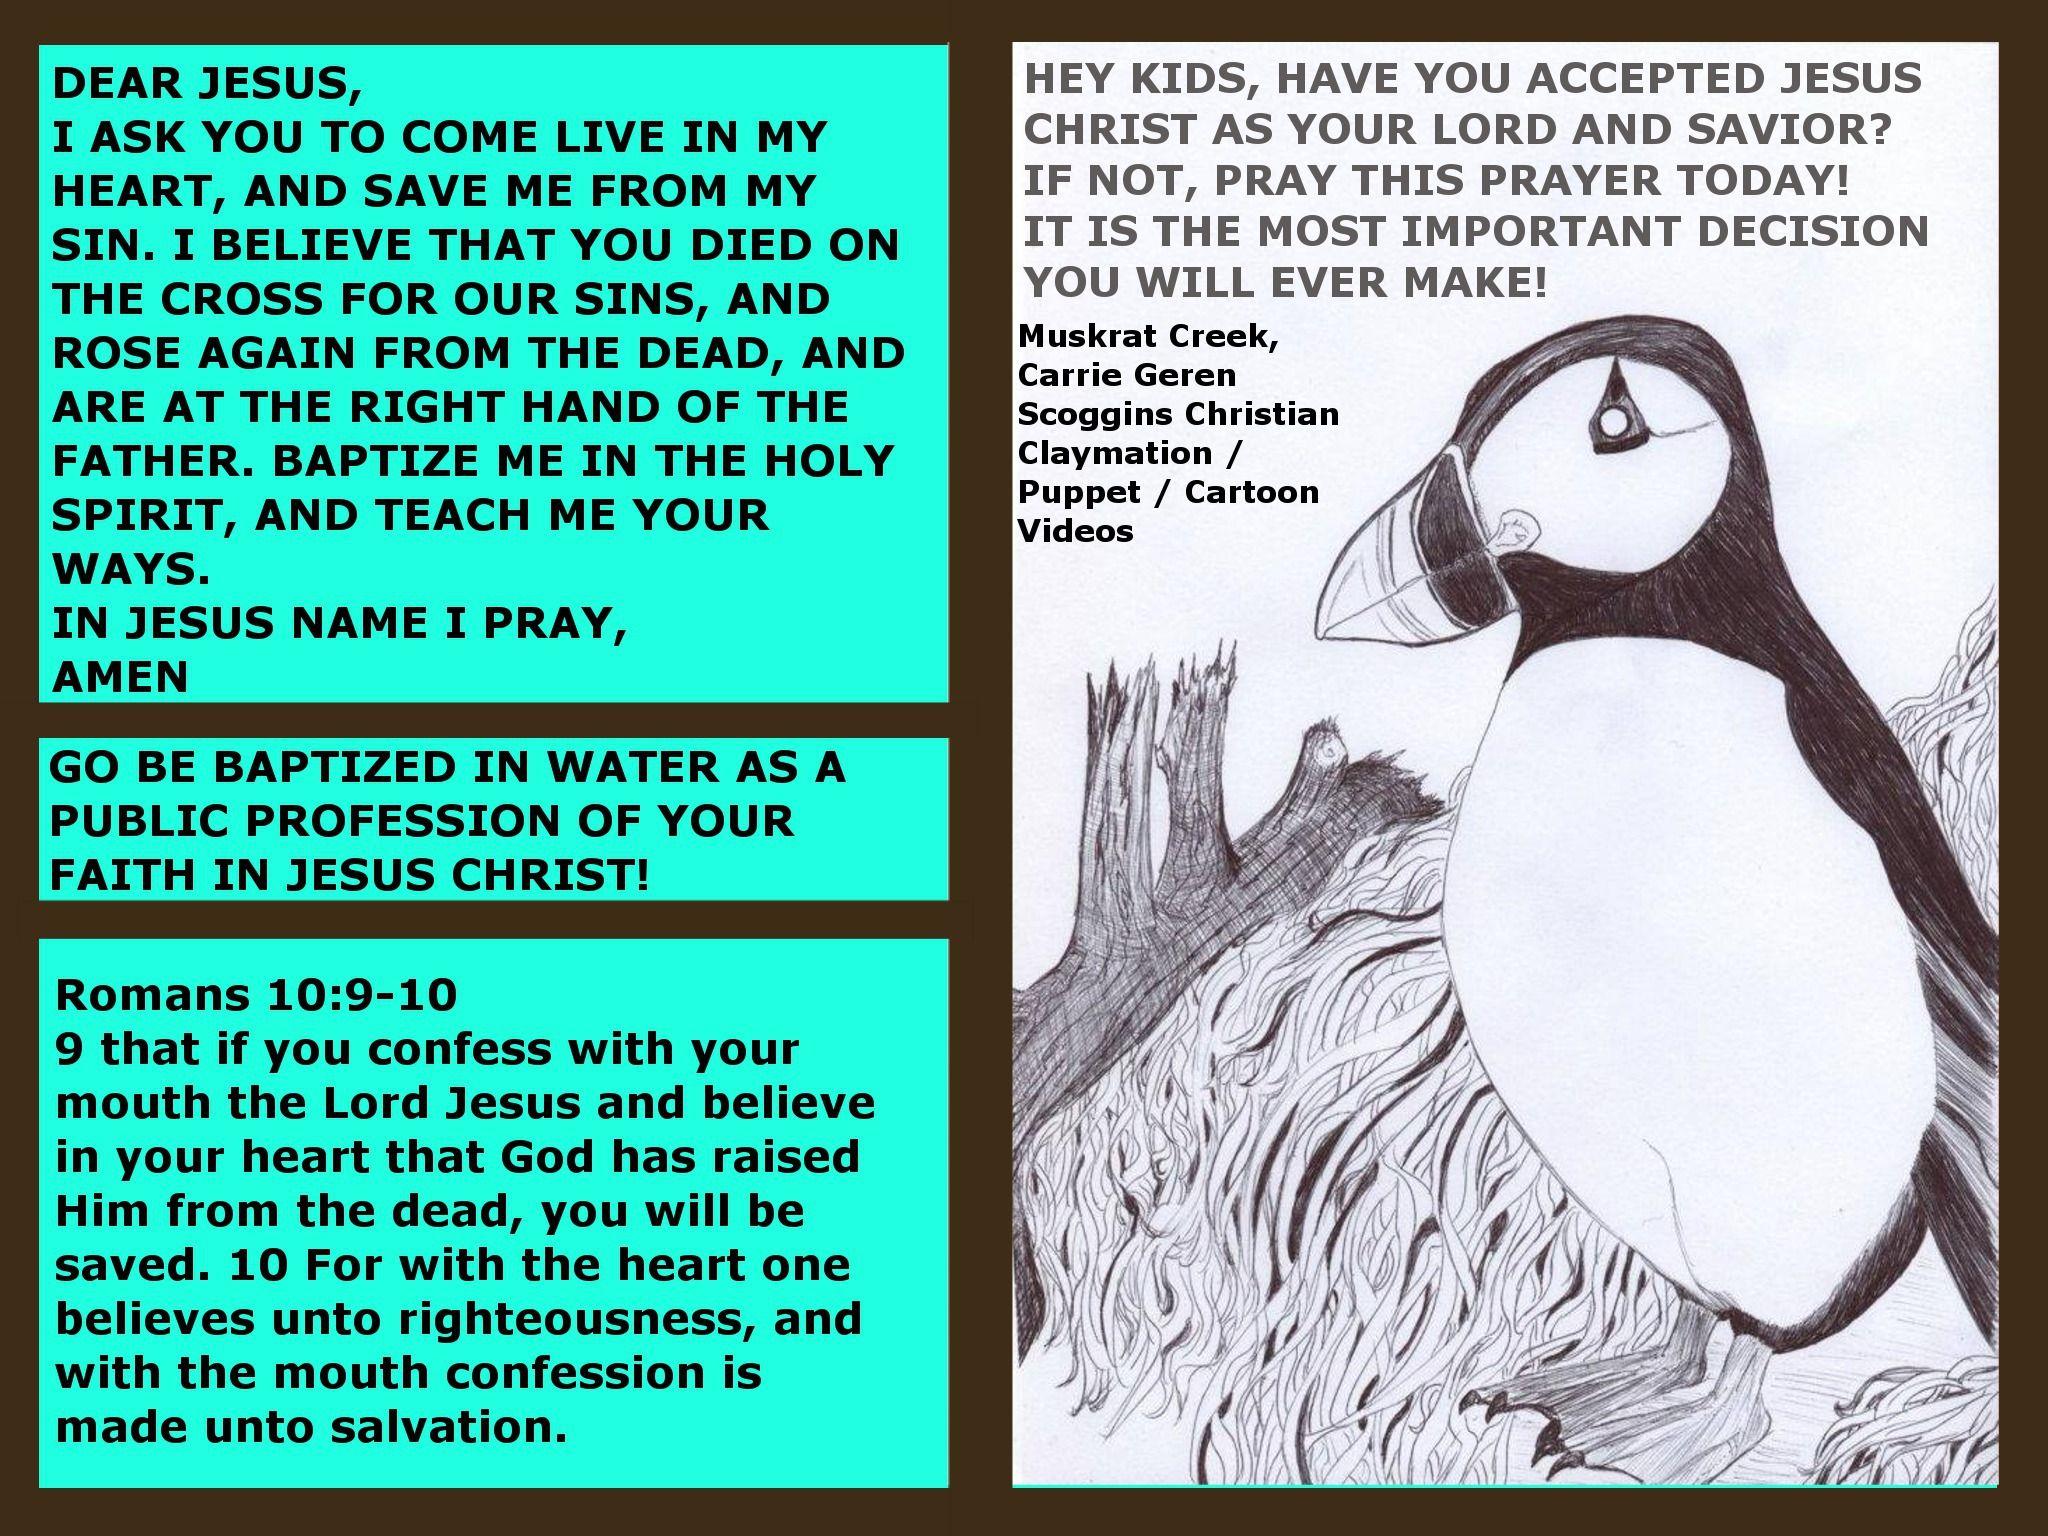 prayer of salvation for kids from muskrat creek carrie geren